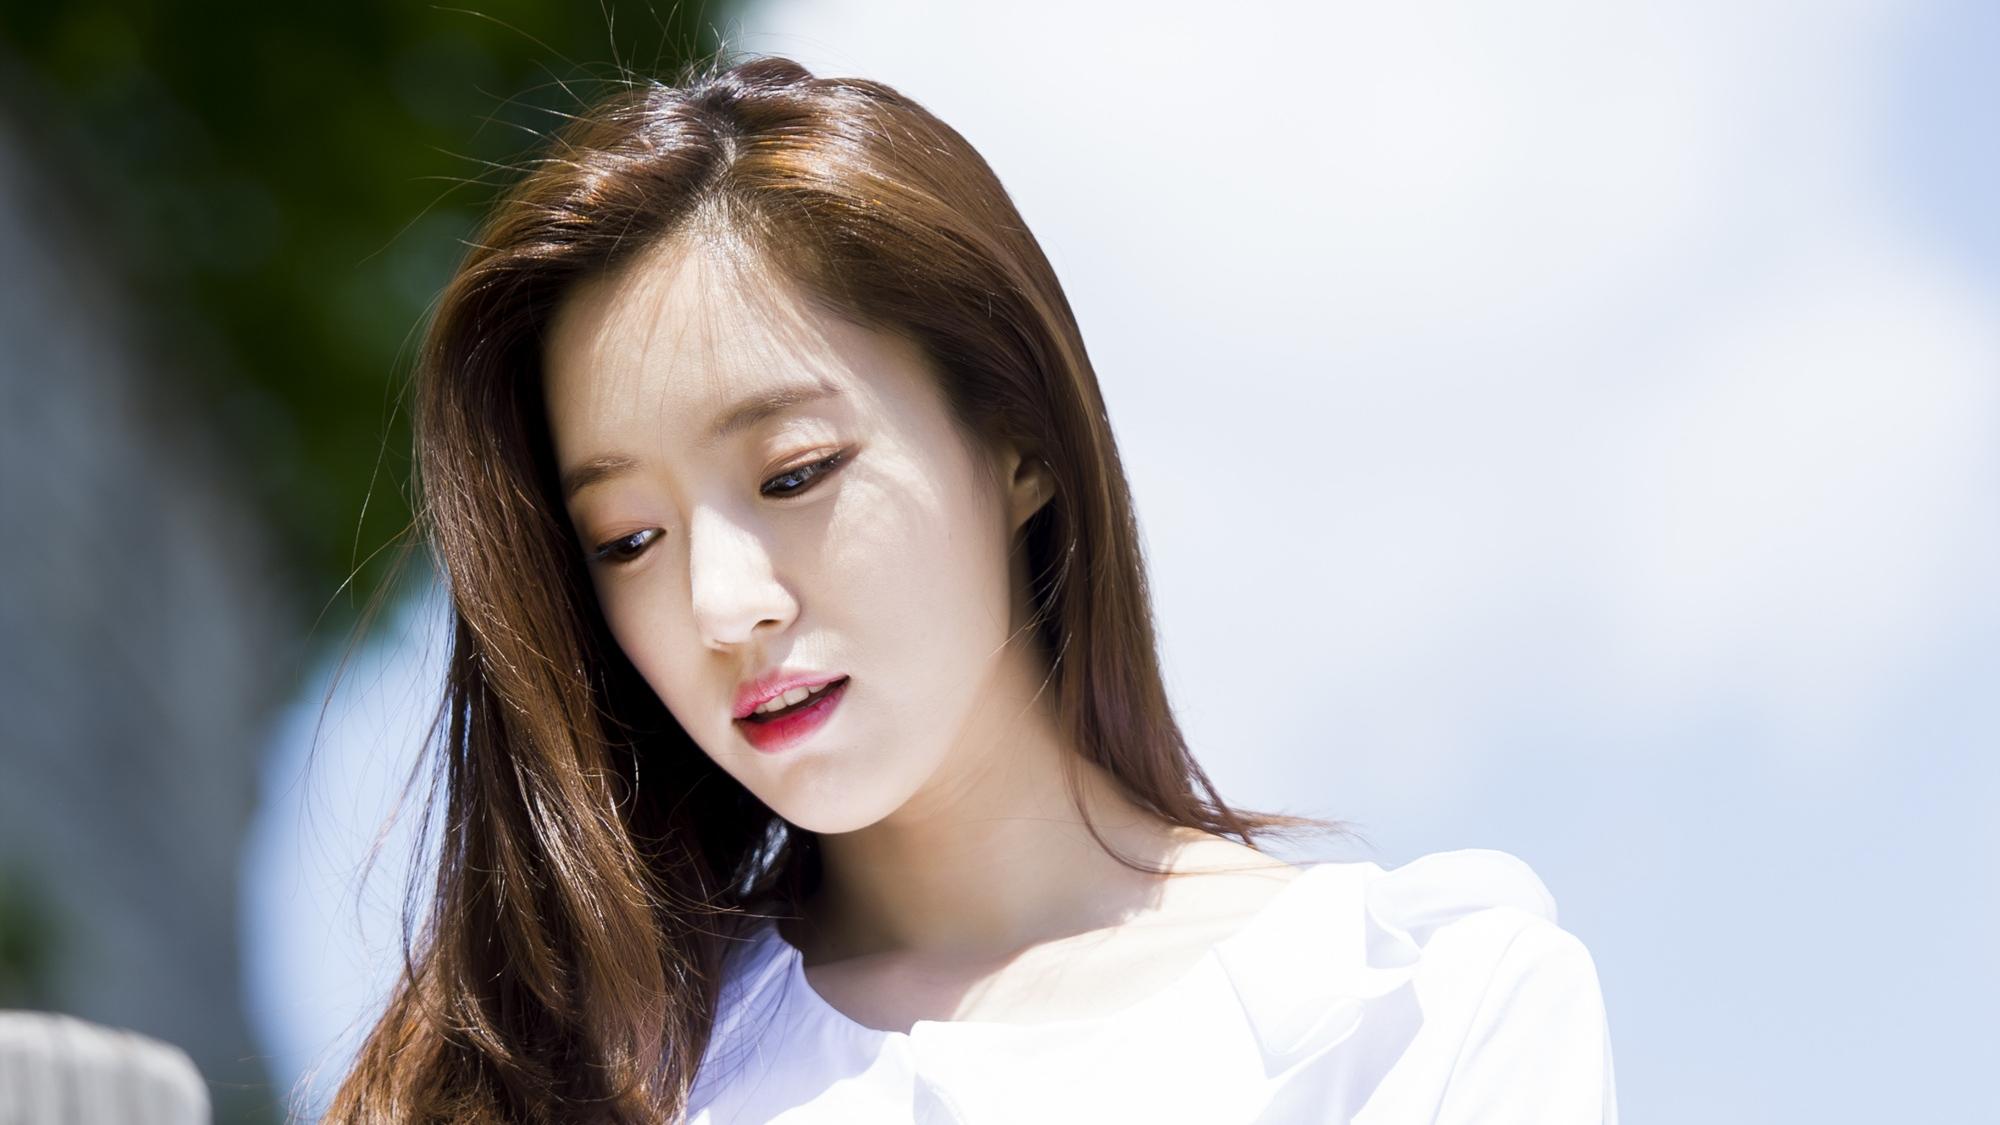 T-ara's Eunjung Confirmed to Return as an Actress Through 'I Will Song' Movie